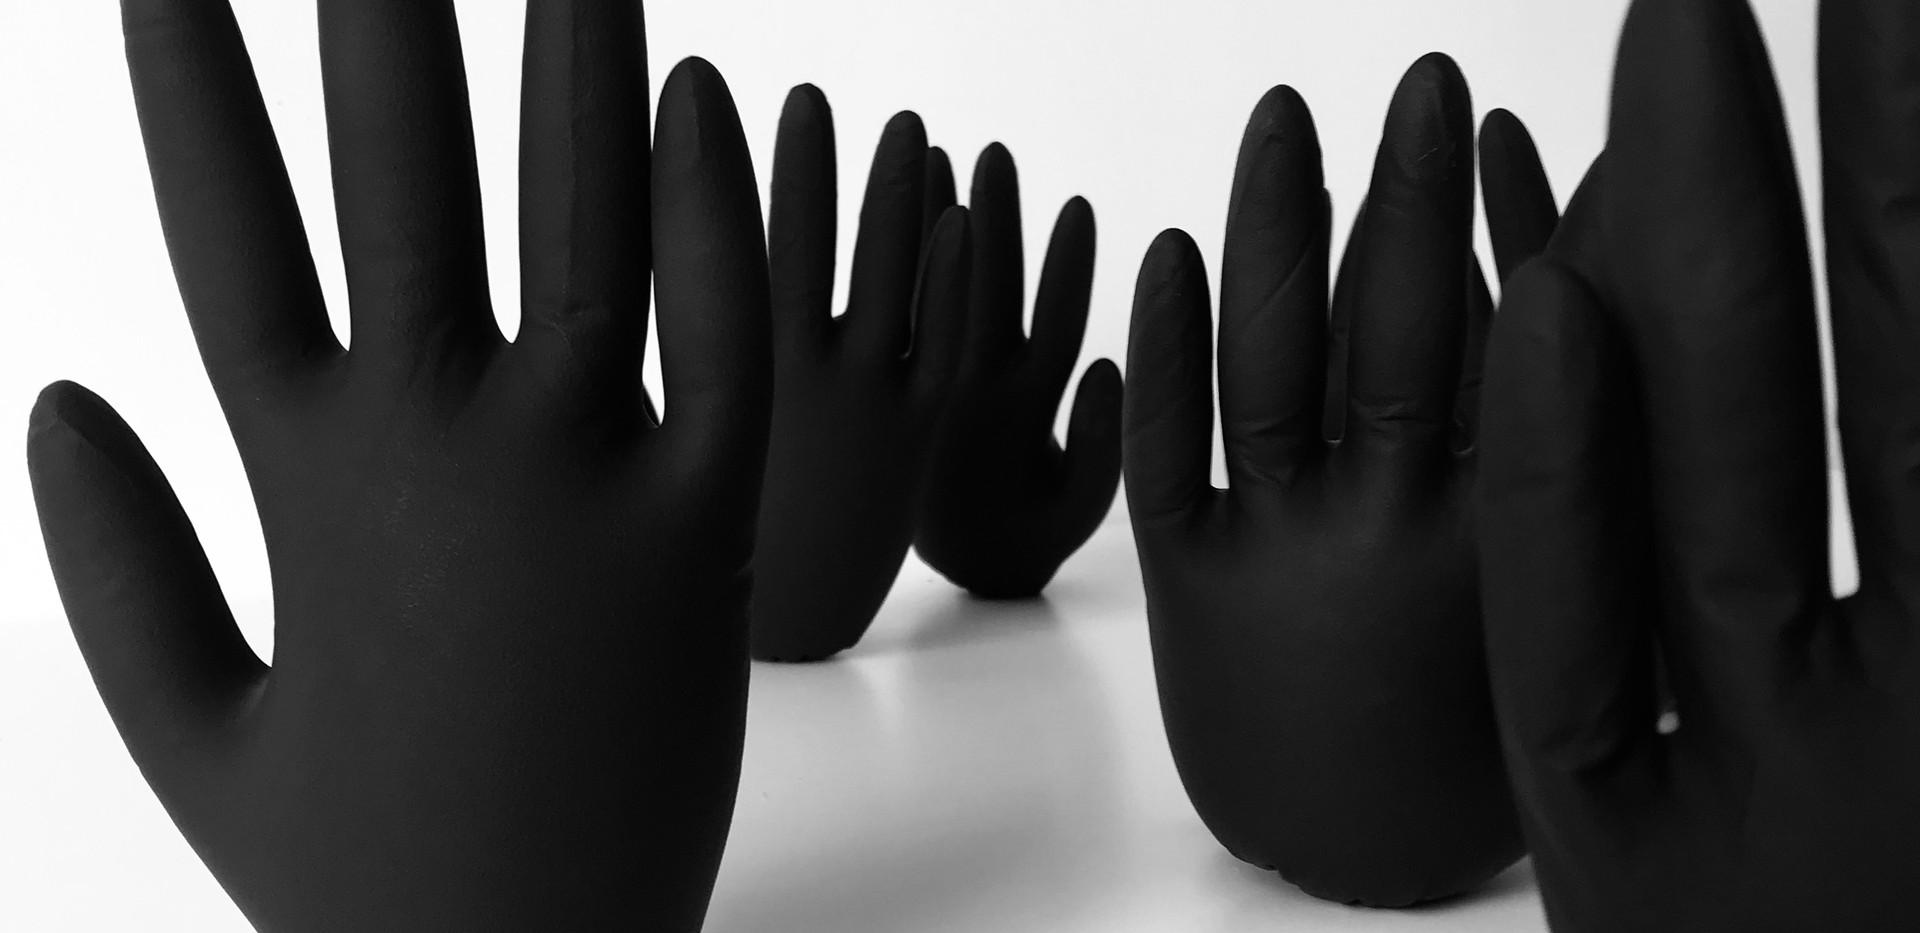 The Land Of Dark Hands